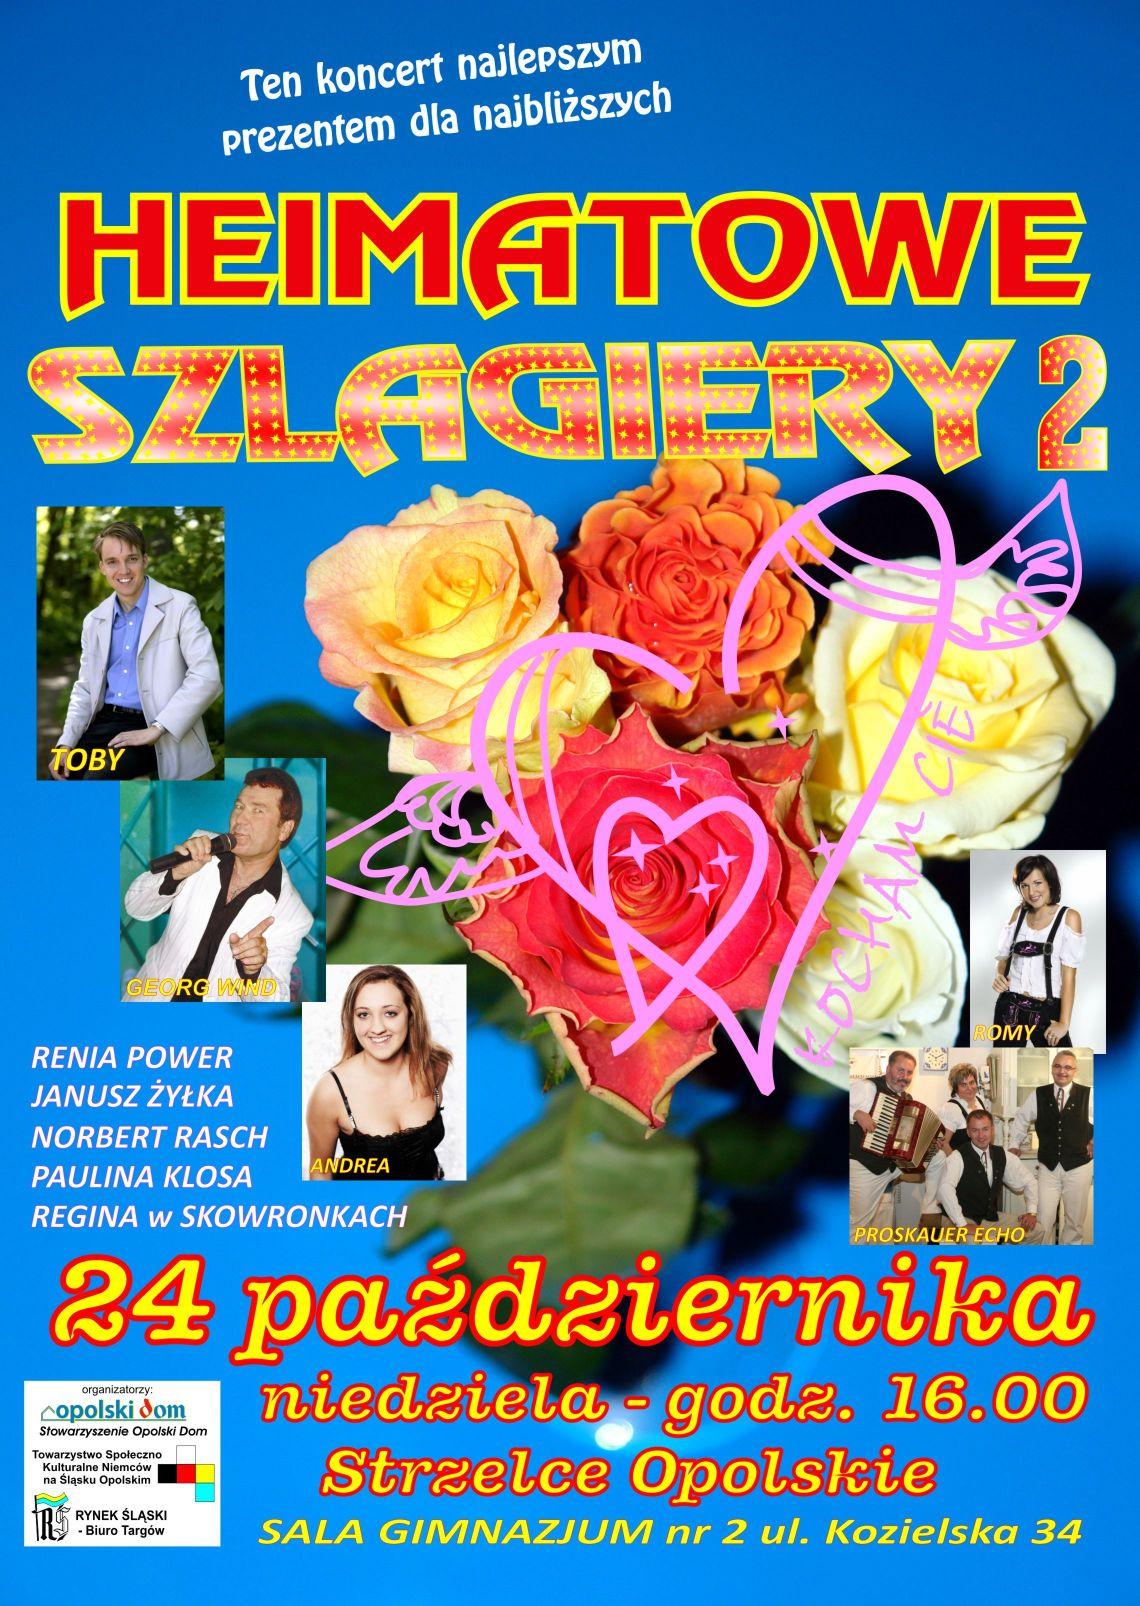 PLAKAT HEIMATOWE październik 2010 cdr.jpeg